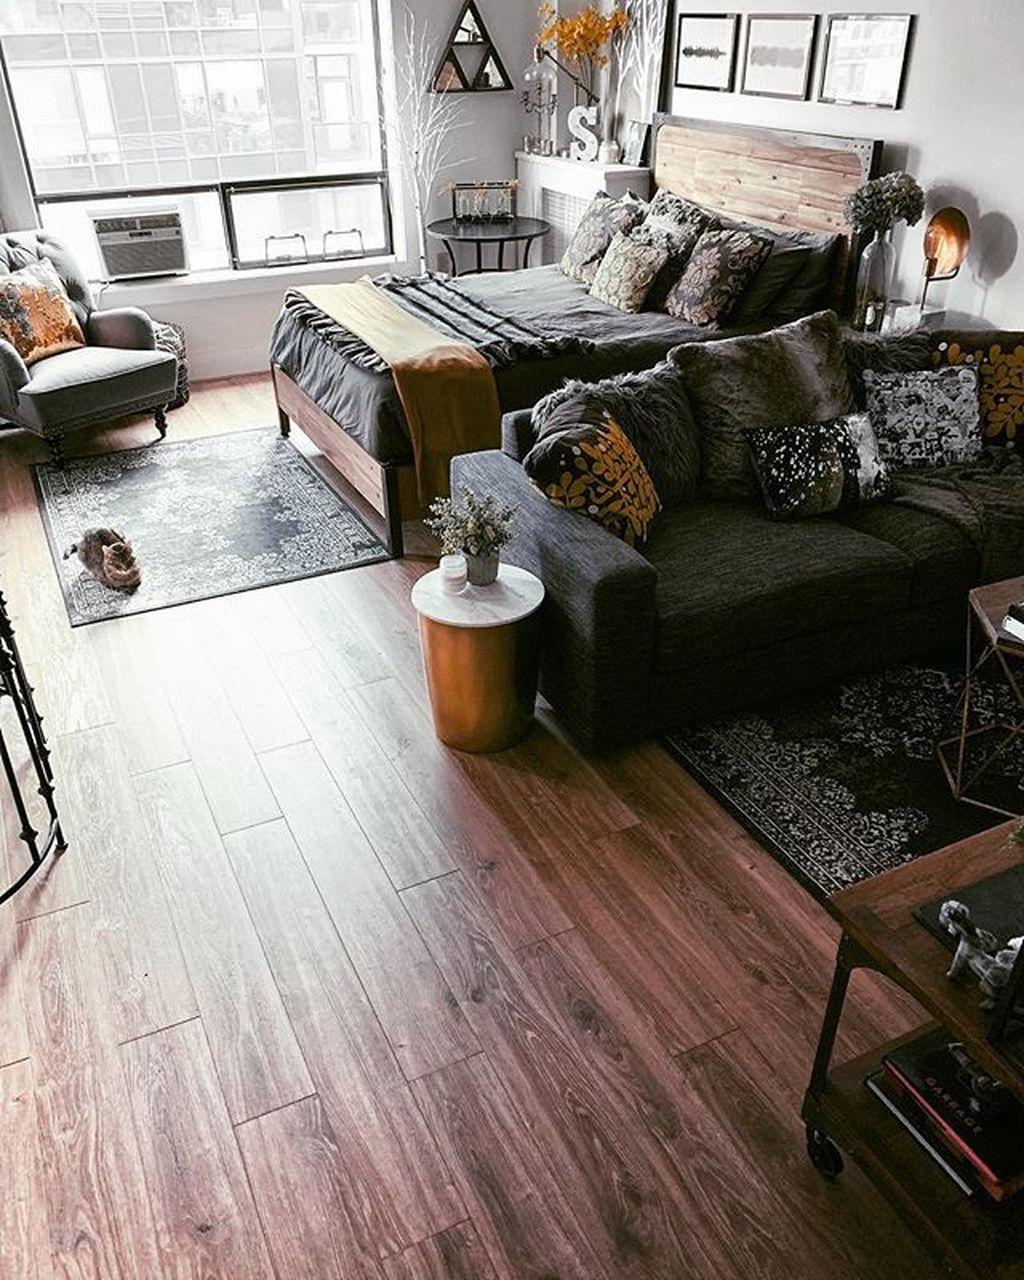 The Best Studio Apartment Layout Design Ideas 06